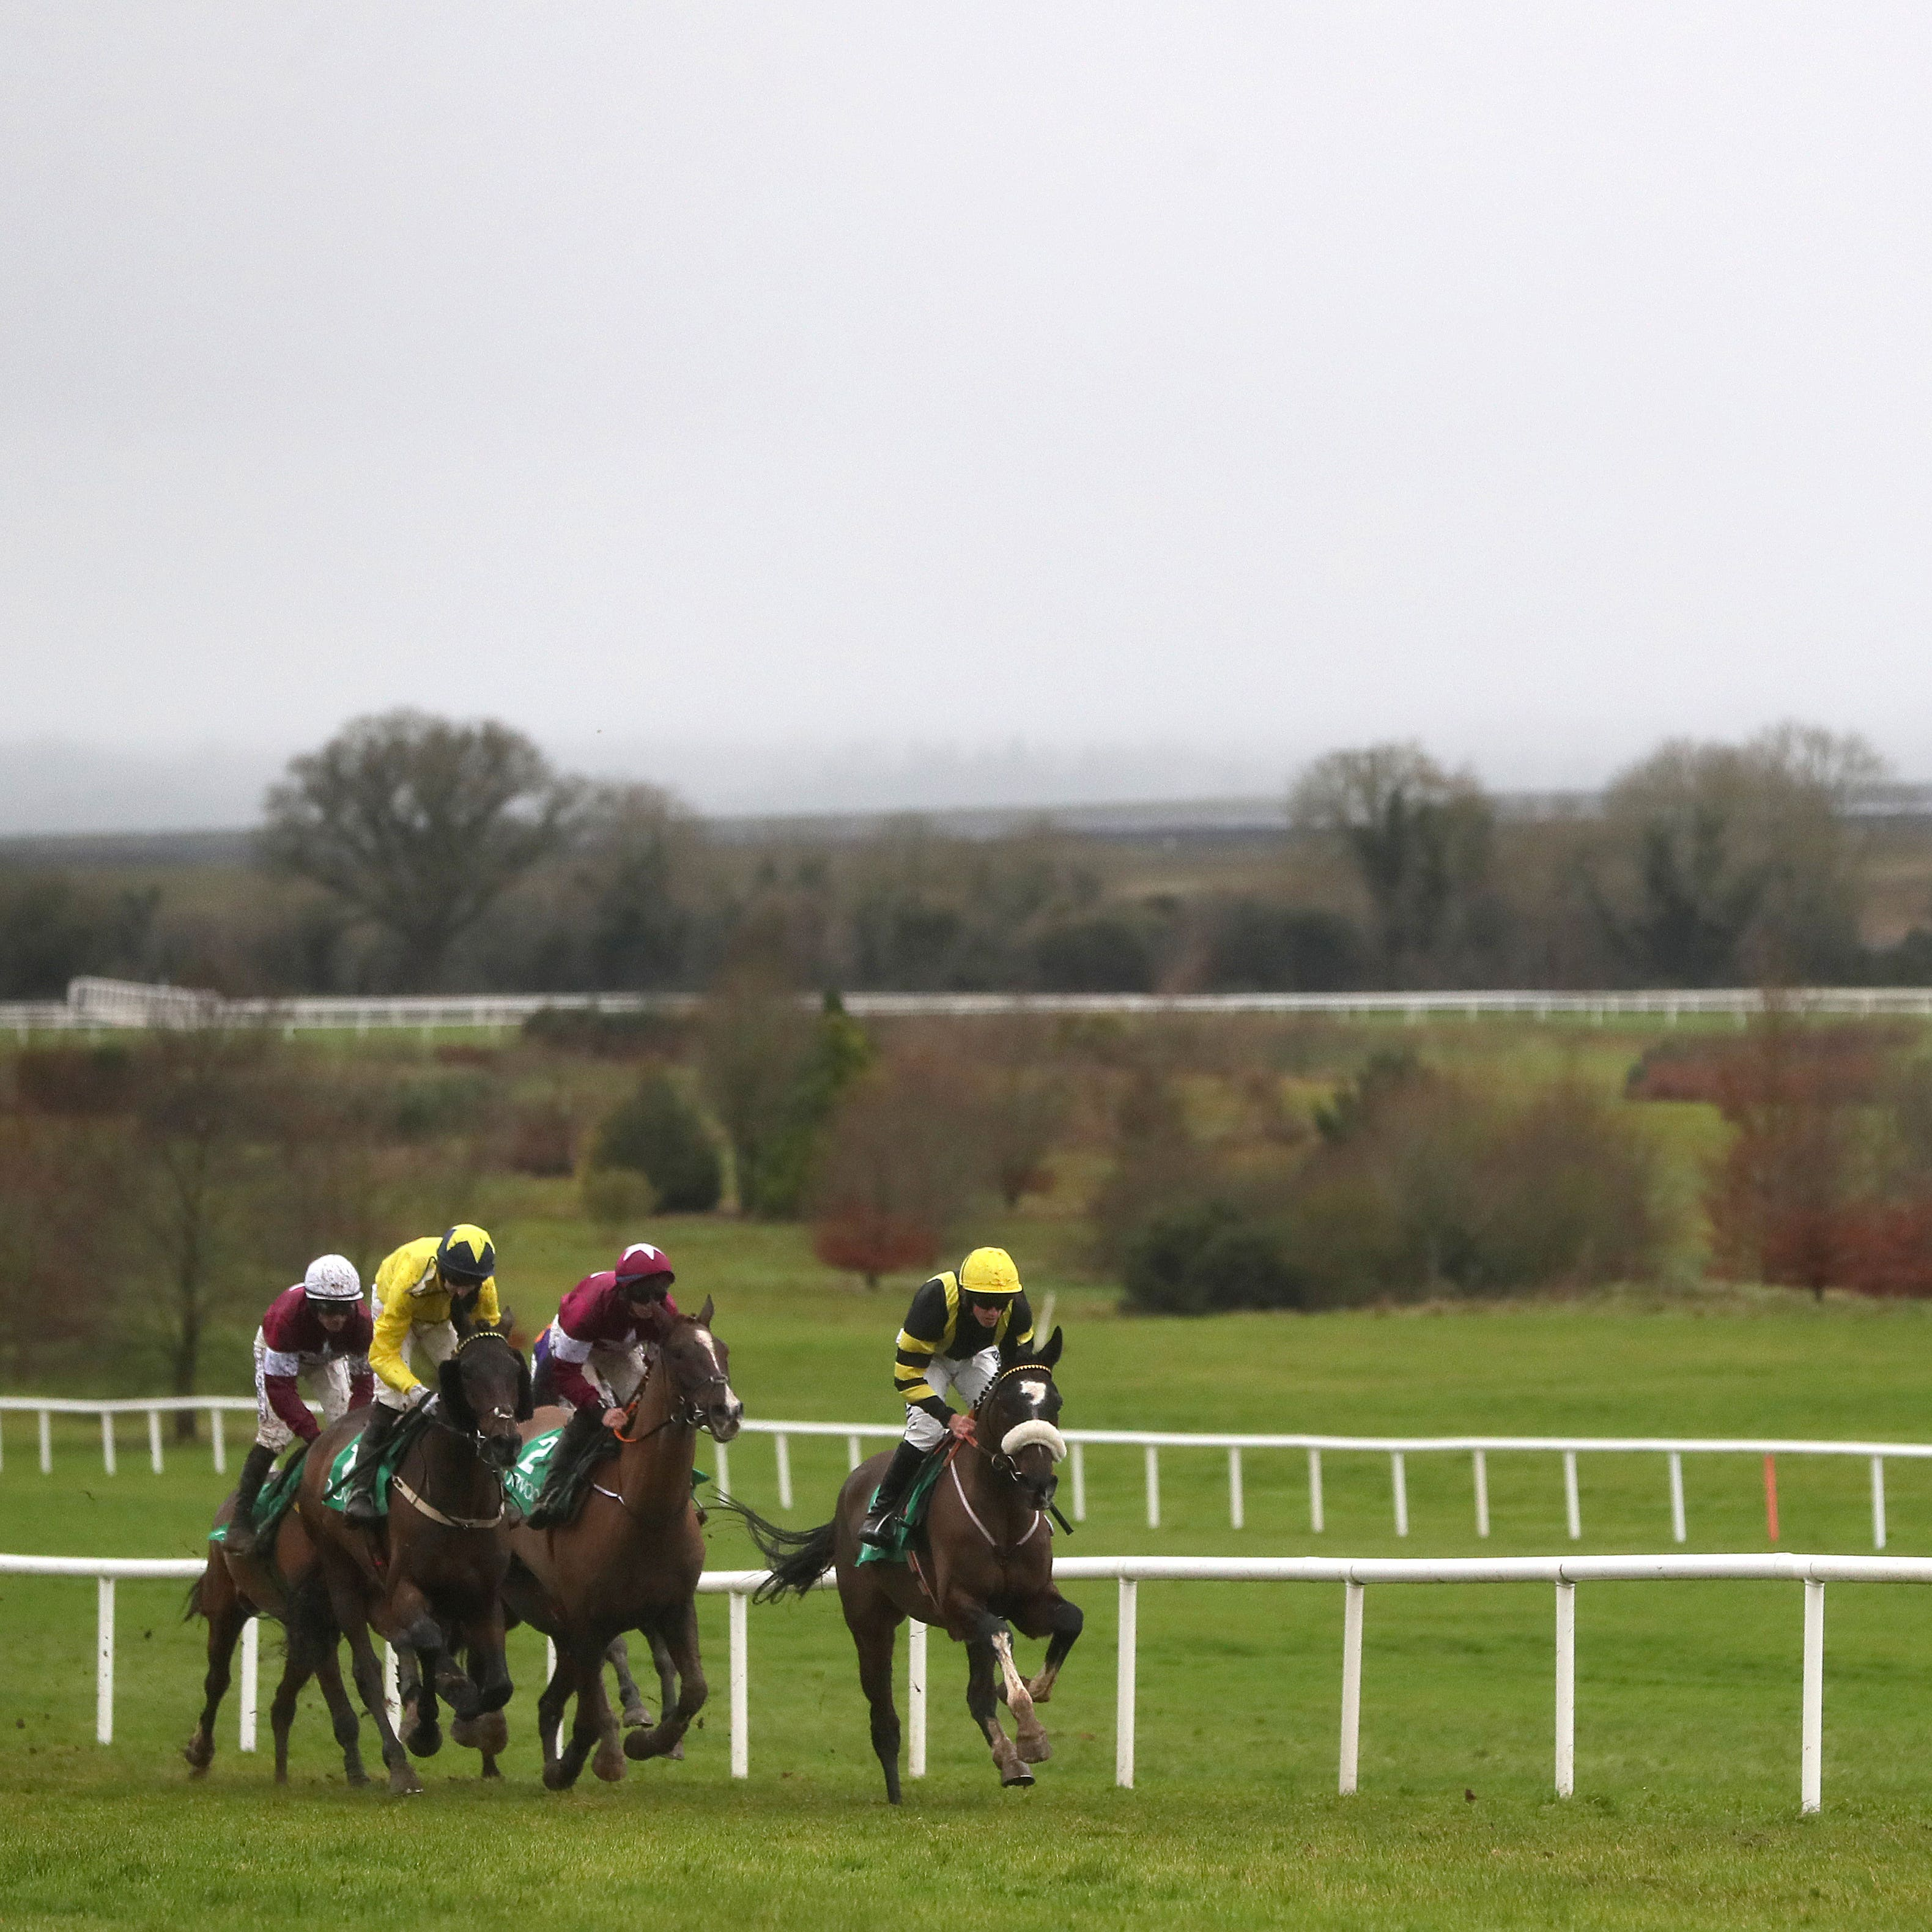 Racing at Navan